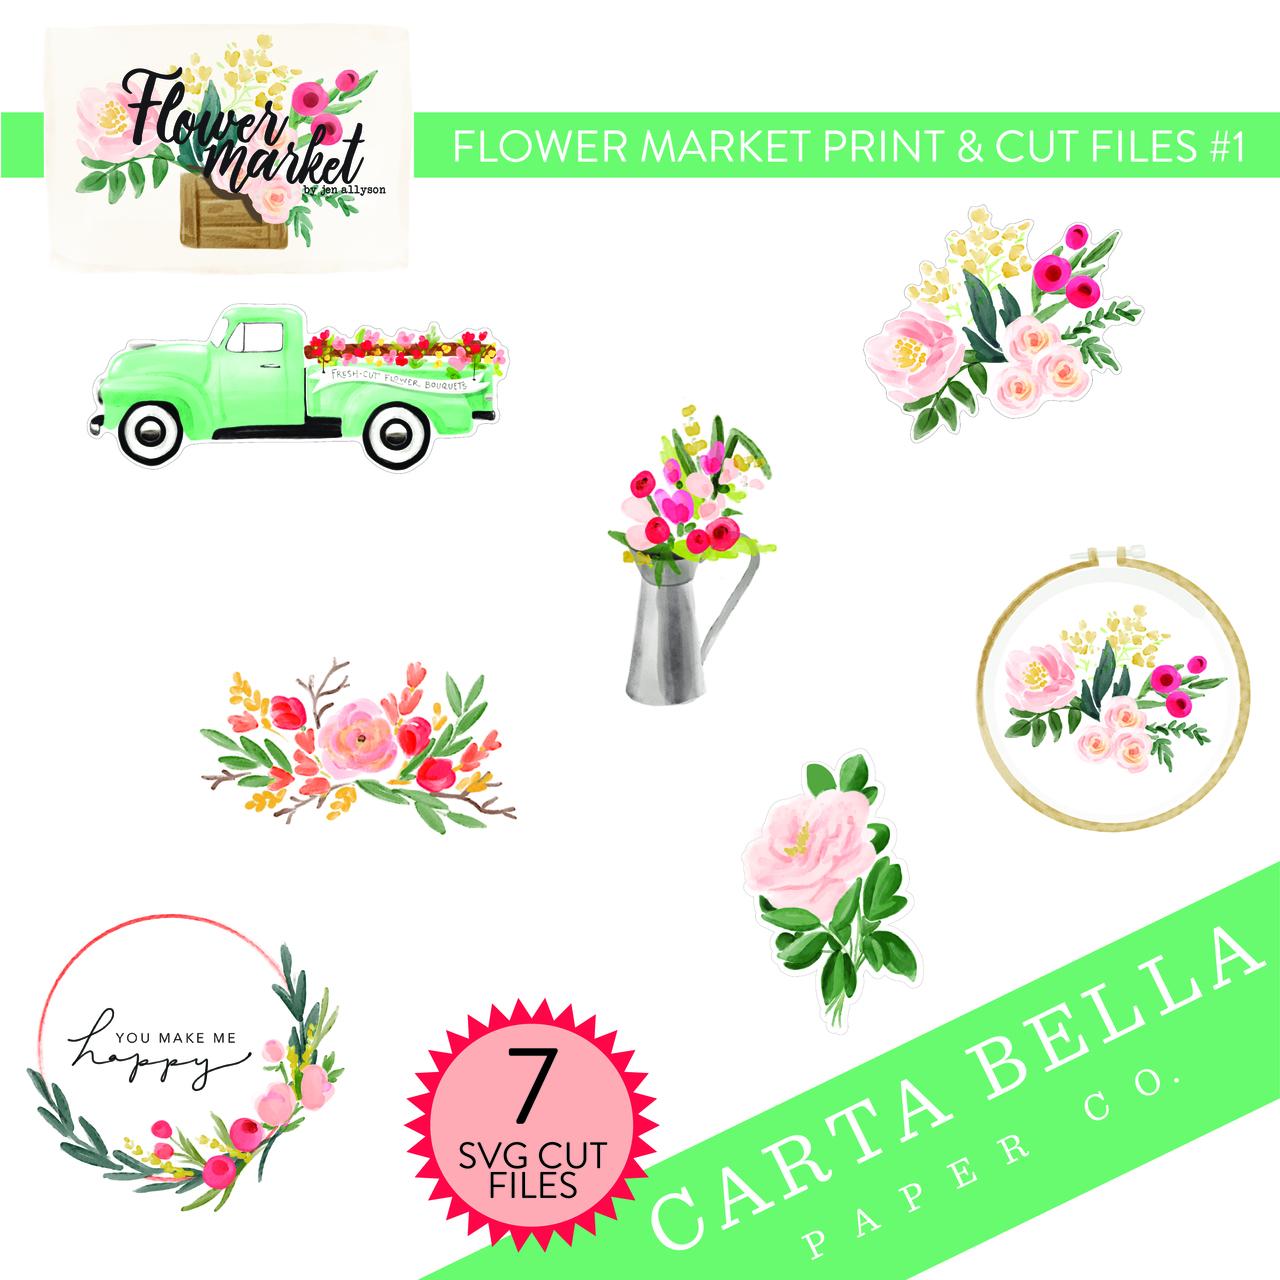 Flower Market Print & Cut Files #1